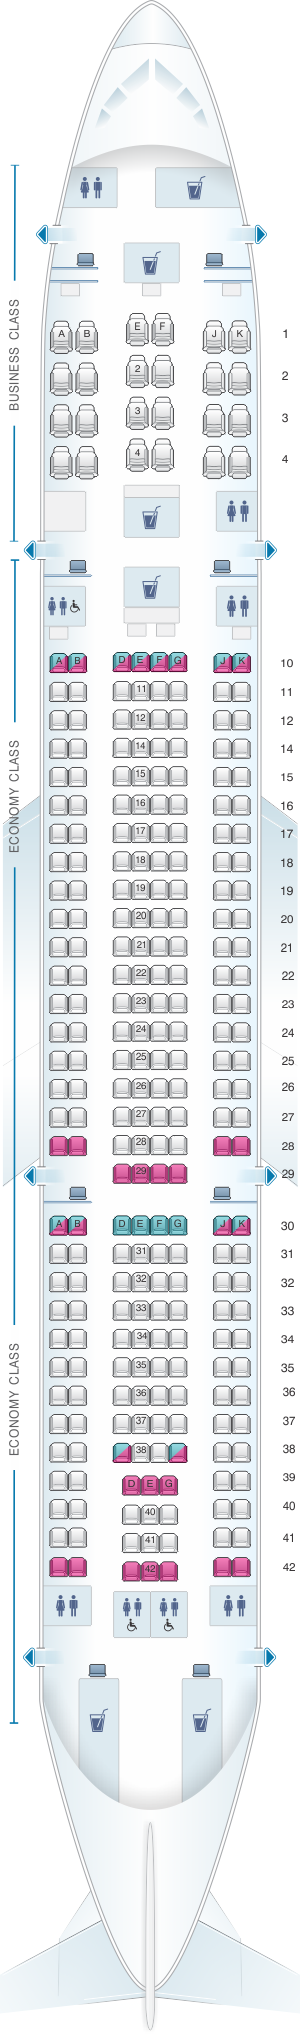 Seat map for Qatar Airways Airbus A330 200 272pax